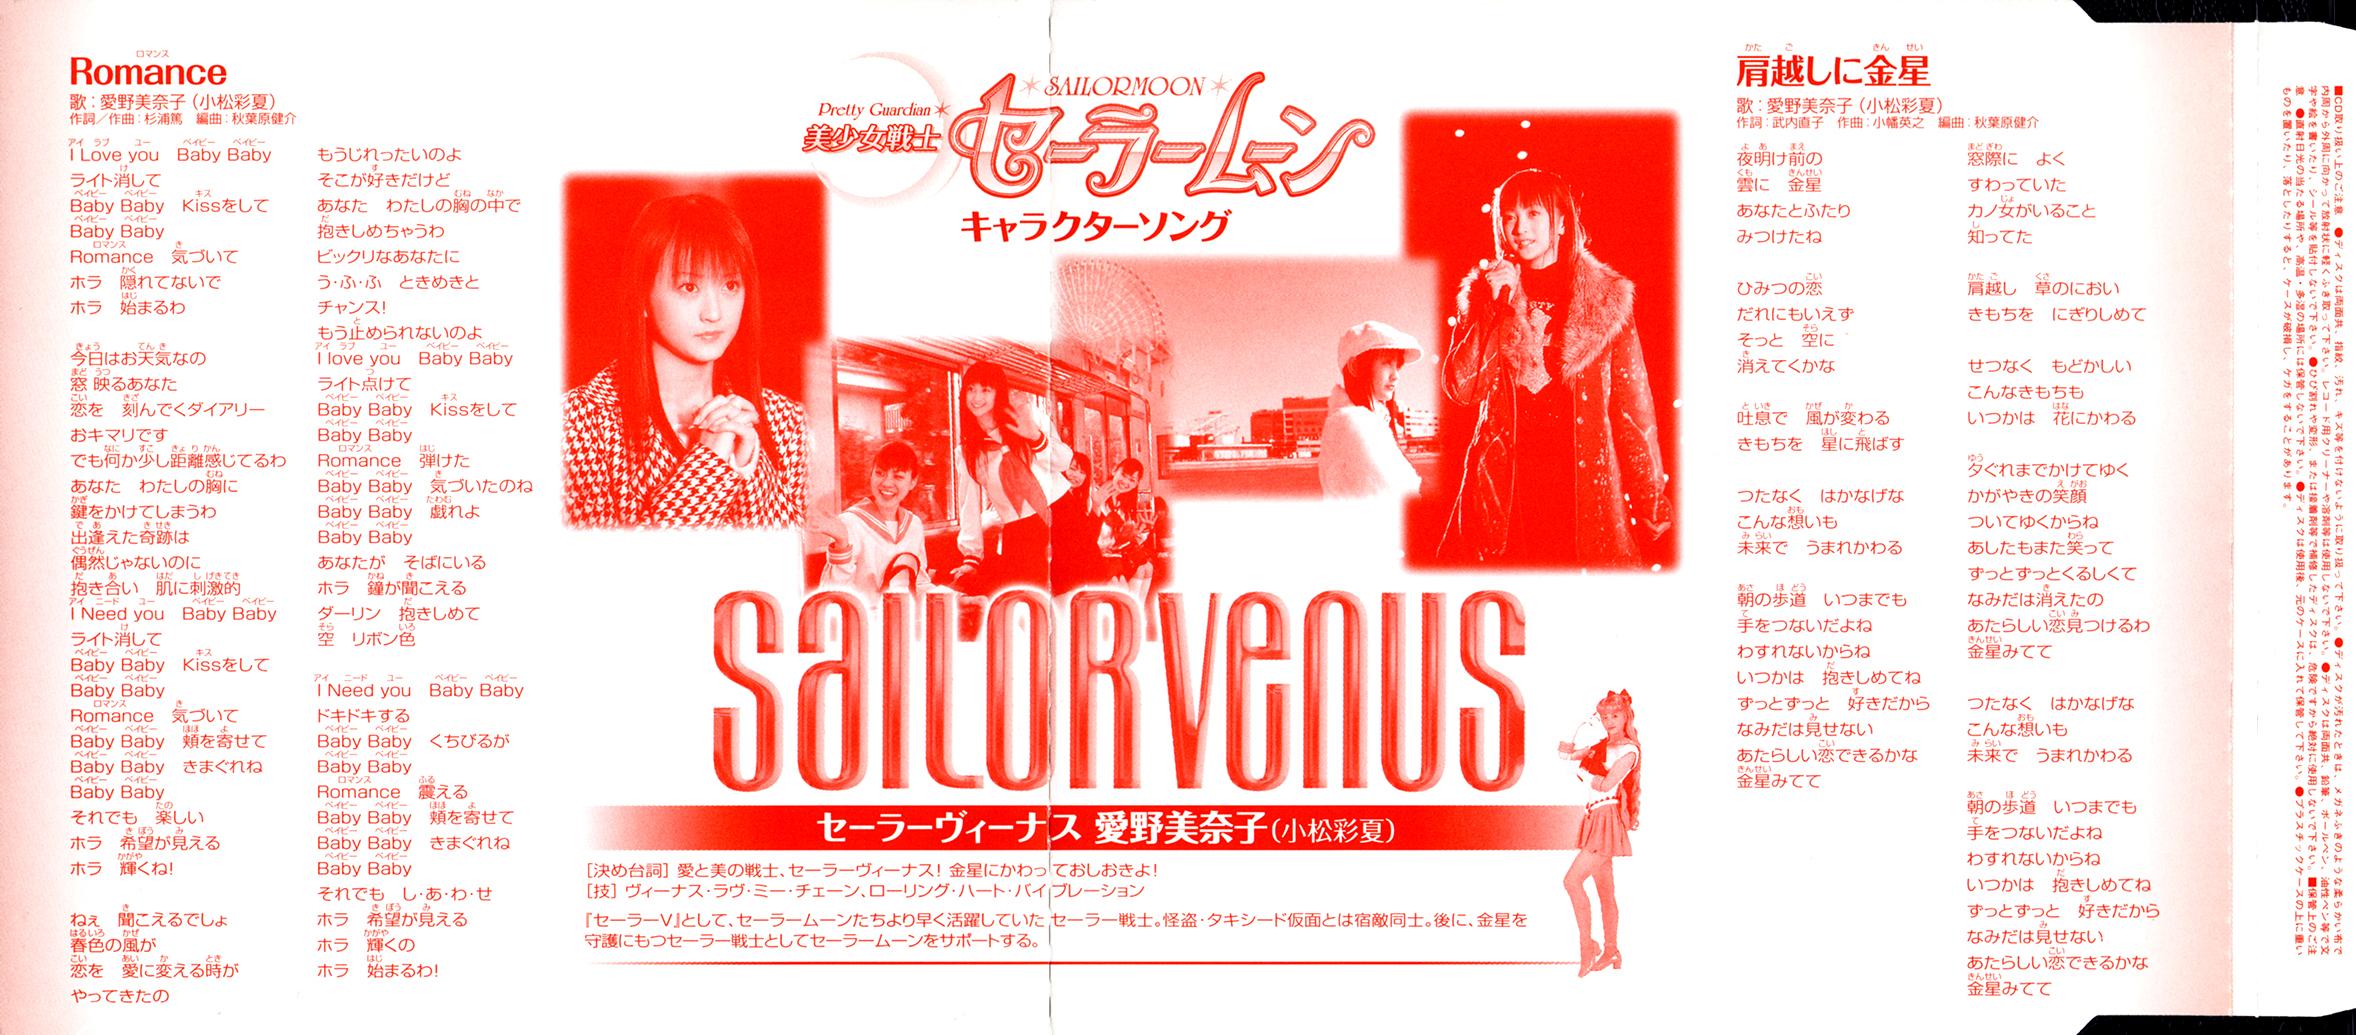 Pgsm_sailor_venus_03